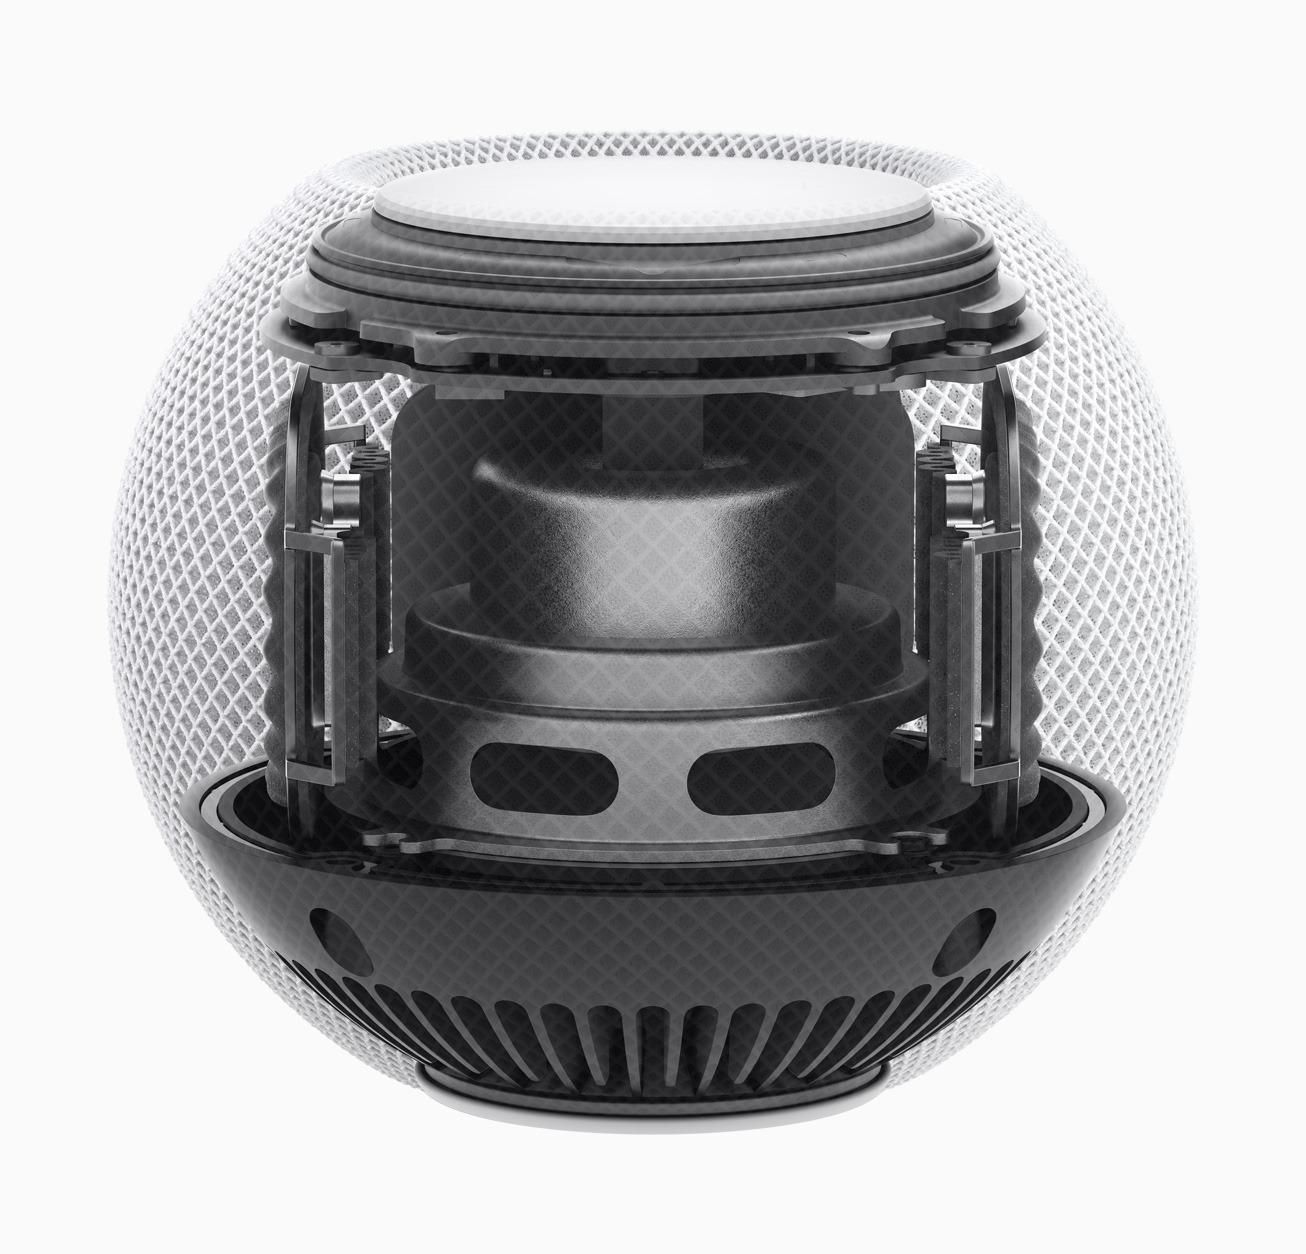 The center drive speaker on the HomePod mini points downwards.